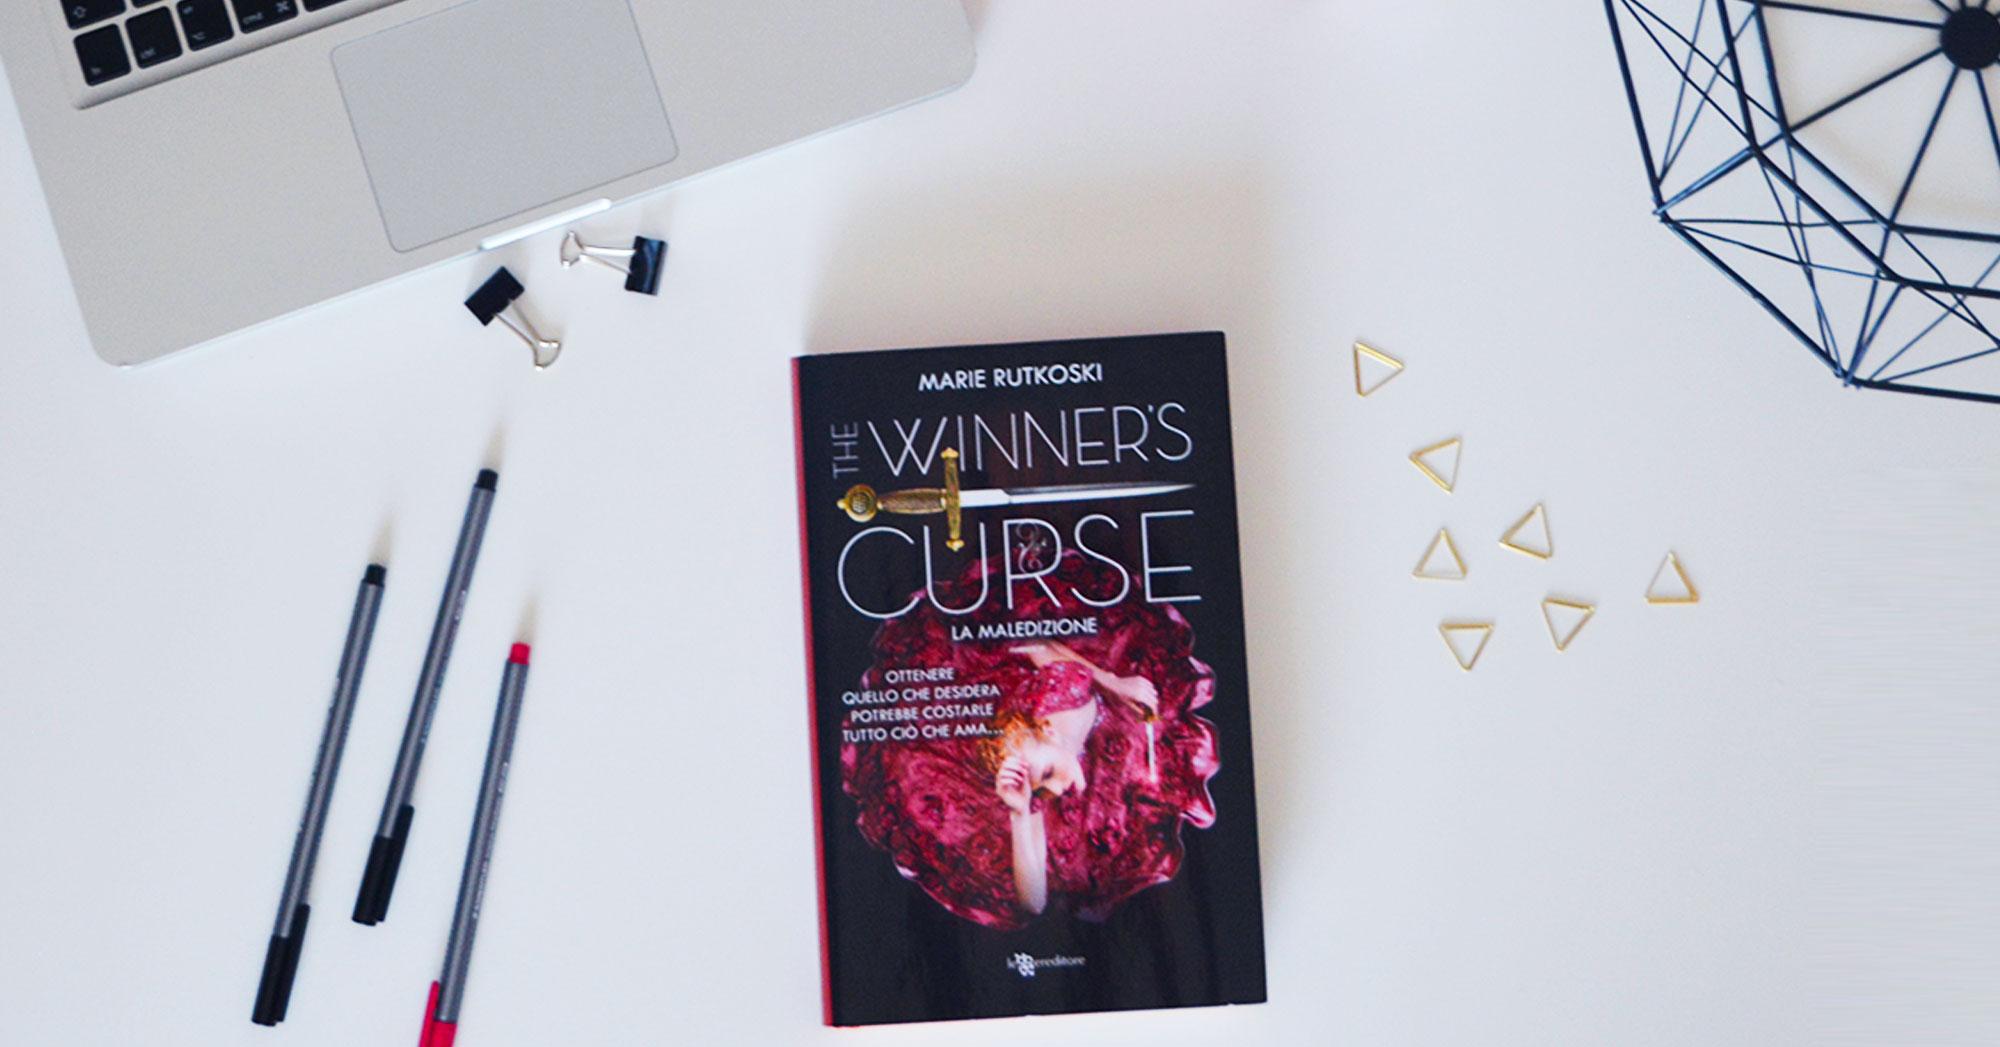 The winner's curse